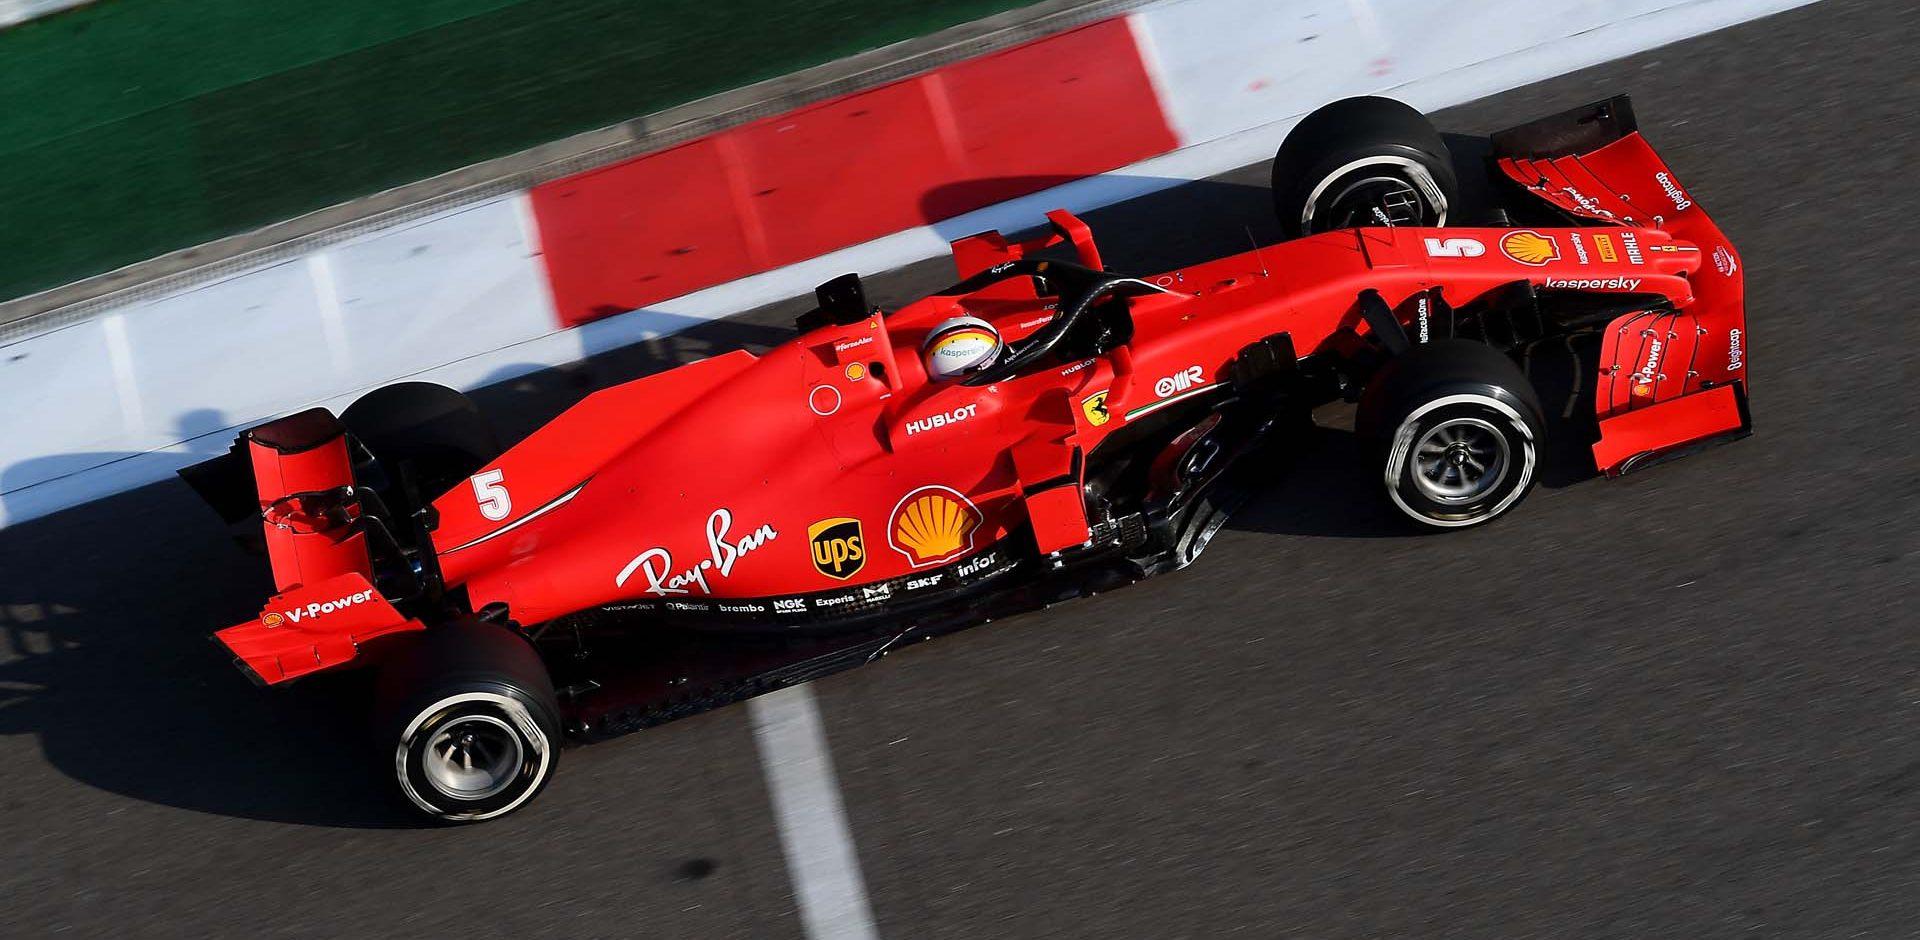 GP RUSSIA F1/2020 -  VENERDI 25/09/2020    credit: @Scuderia Ferrari Press Office Sebastian Vettel Ferrari